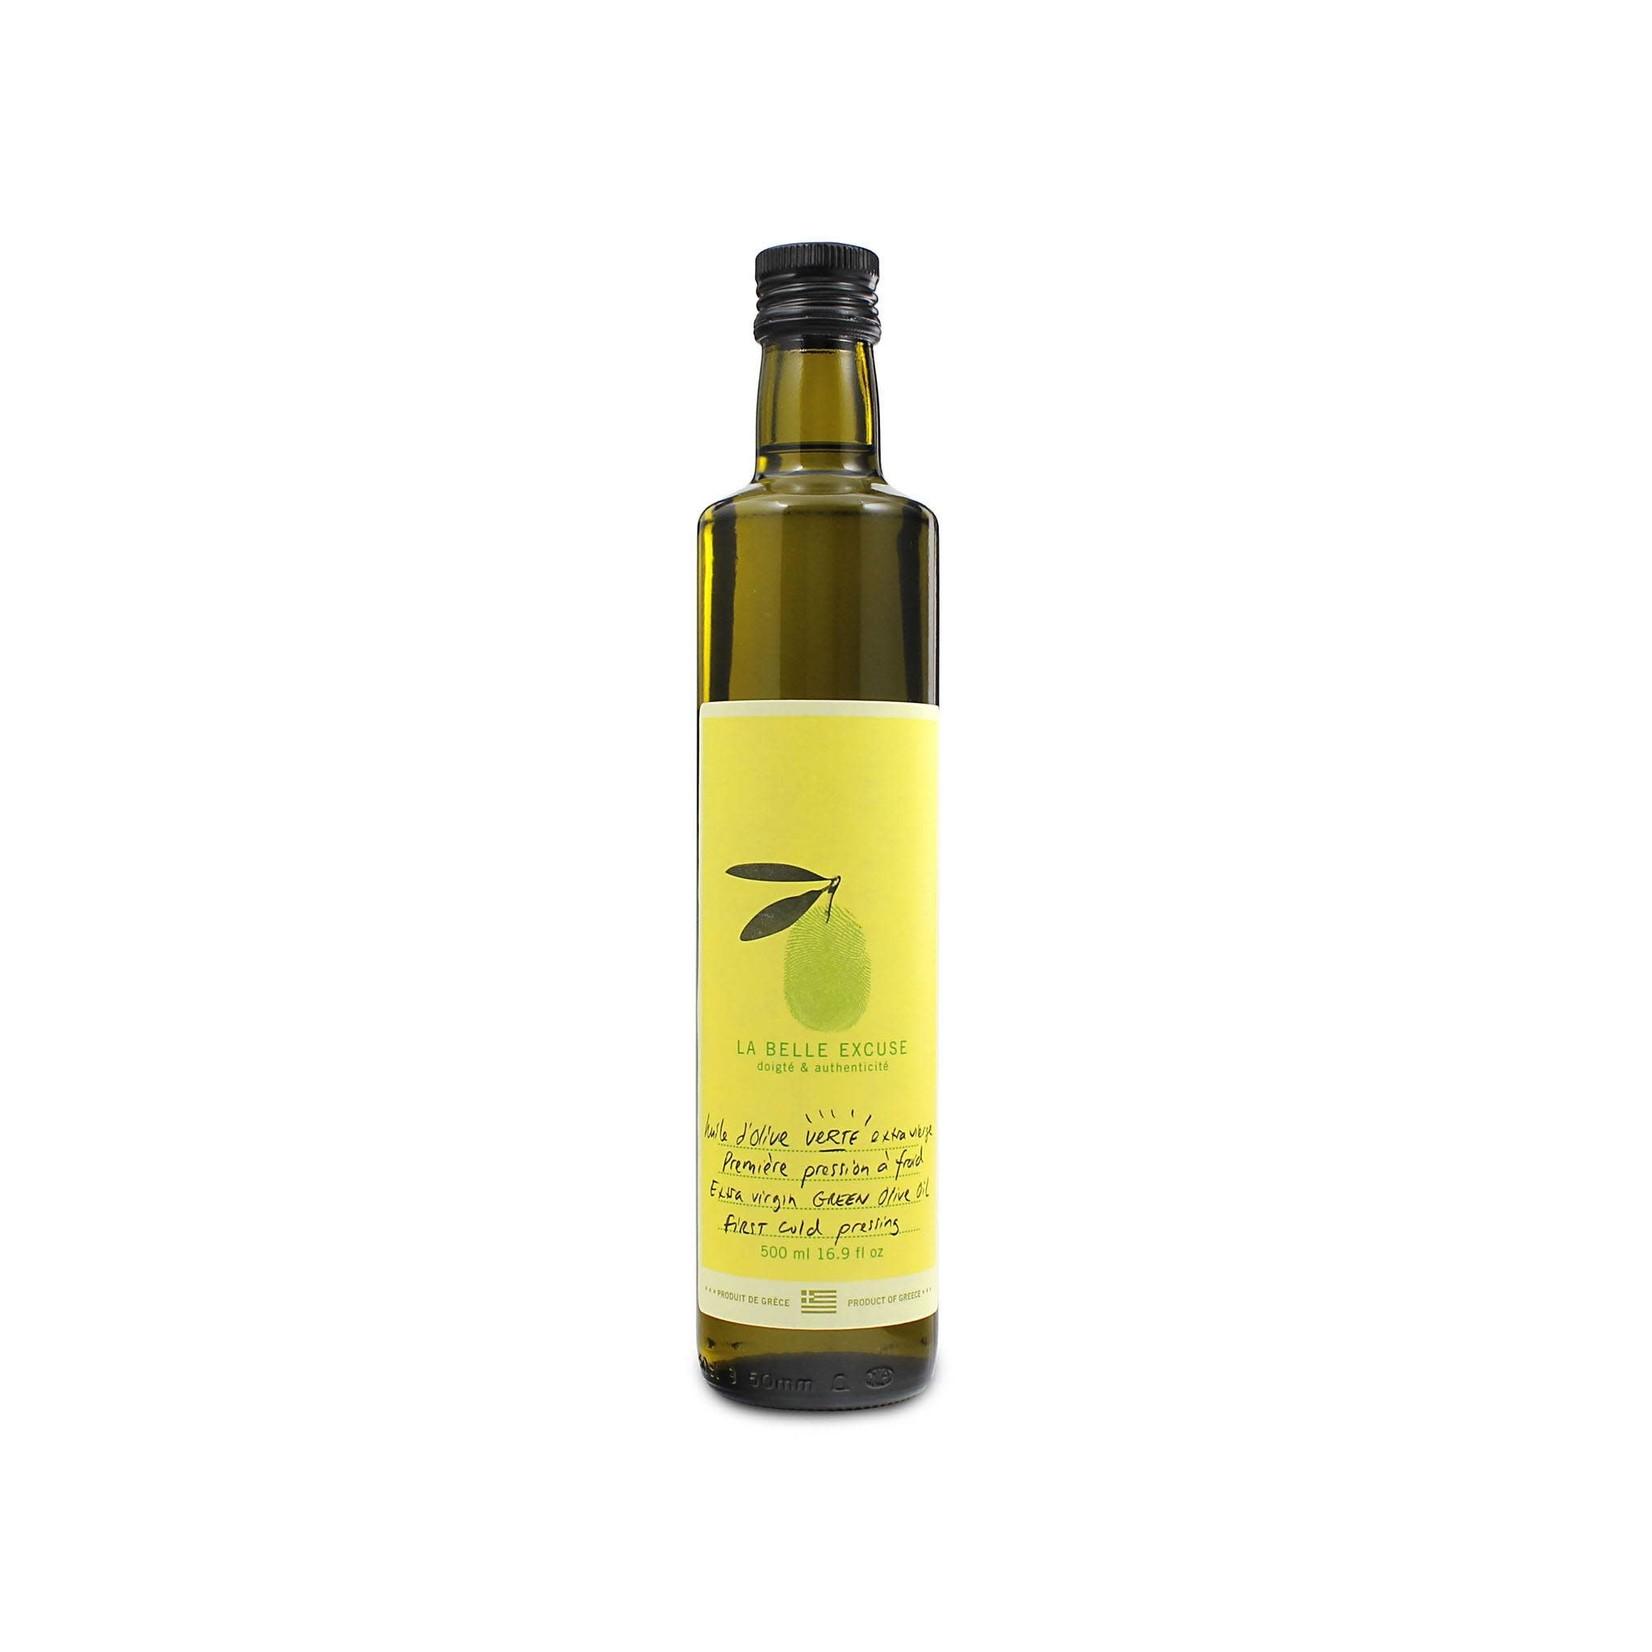 La belle excuse Huile olive extra vierge verte 250ml